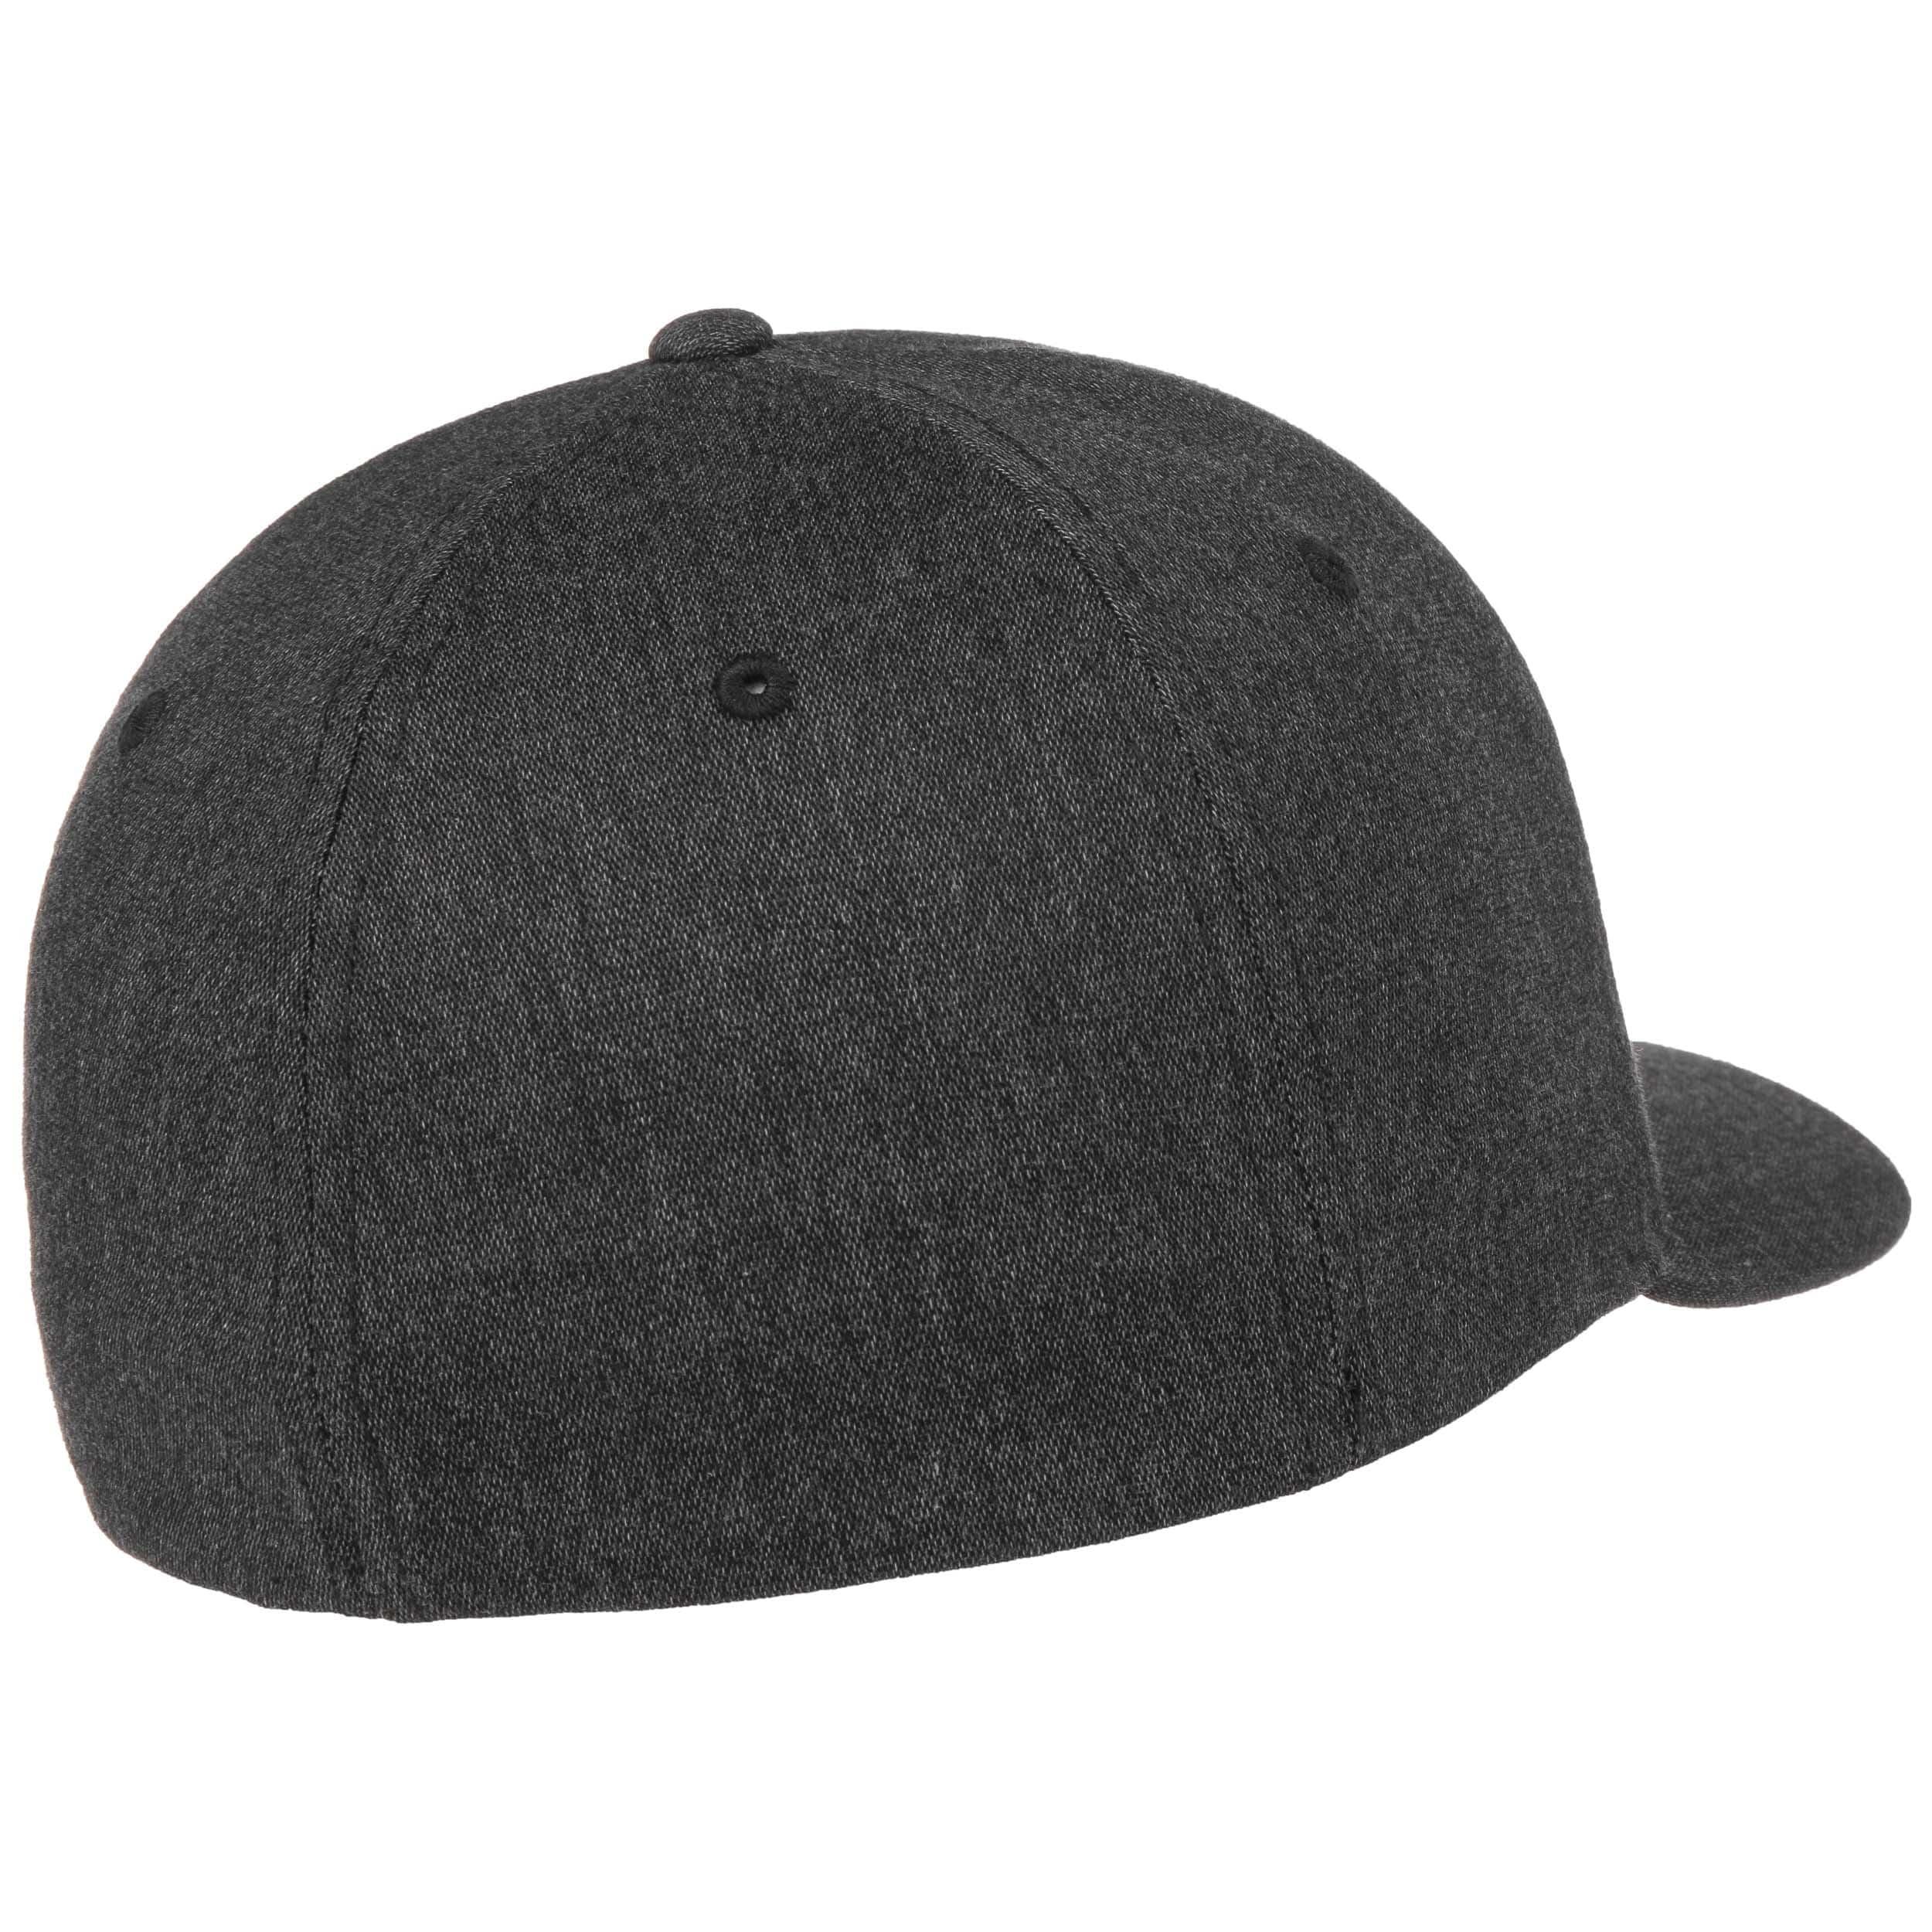 3b433a0a75f24 ... discount code for clouded flexfit cap by fox black 3 cb144 328d6